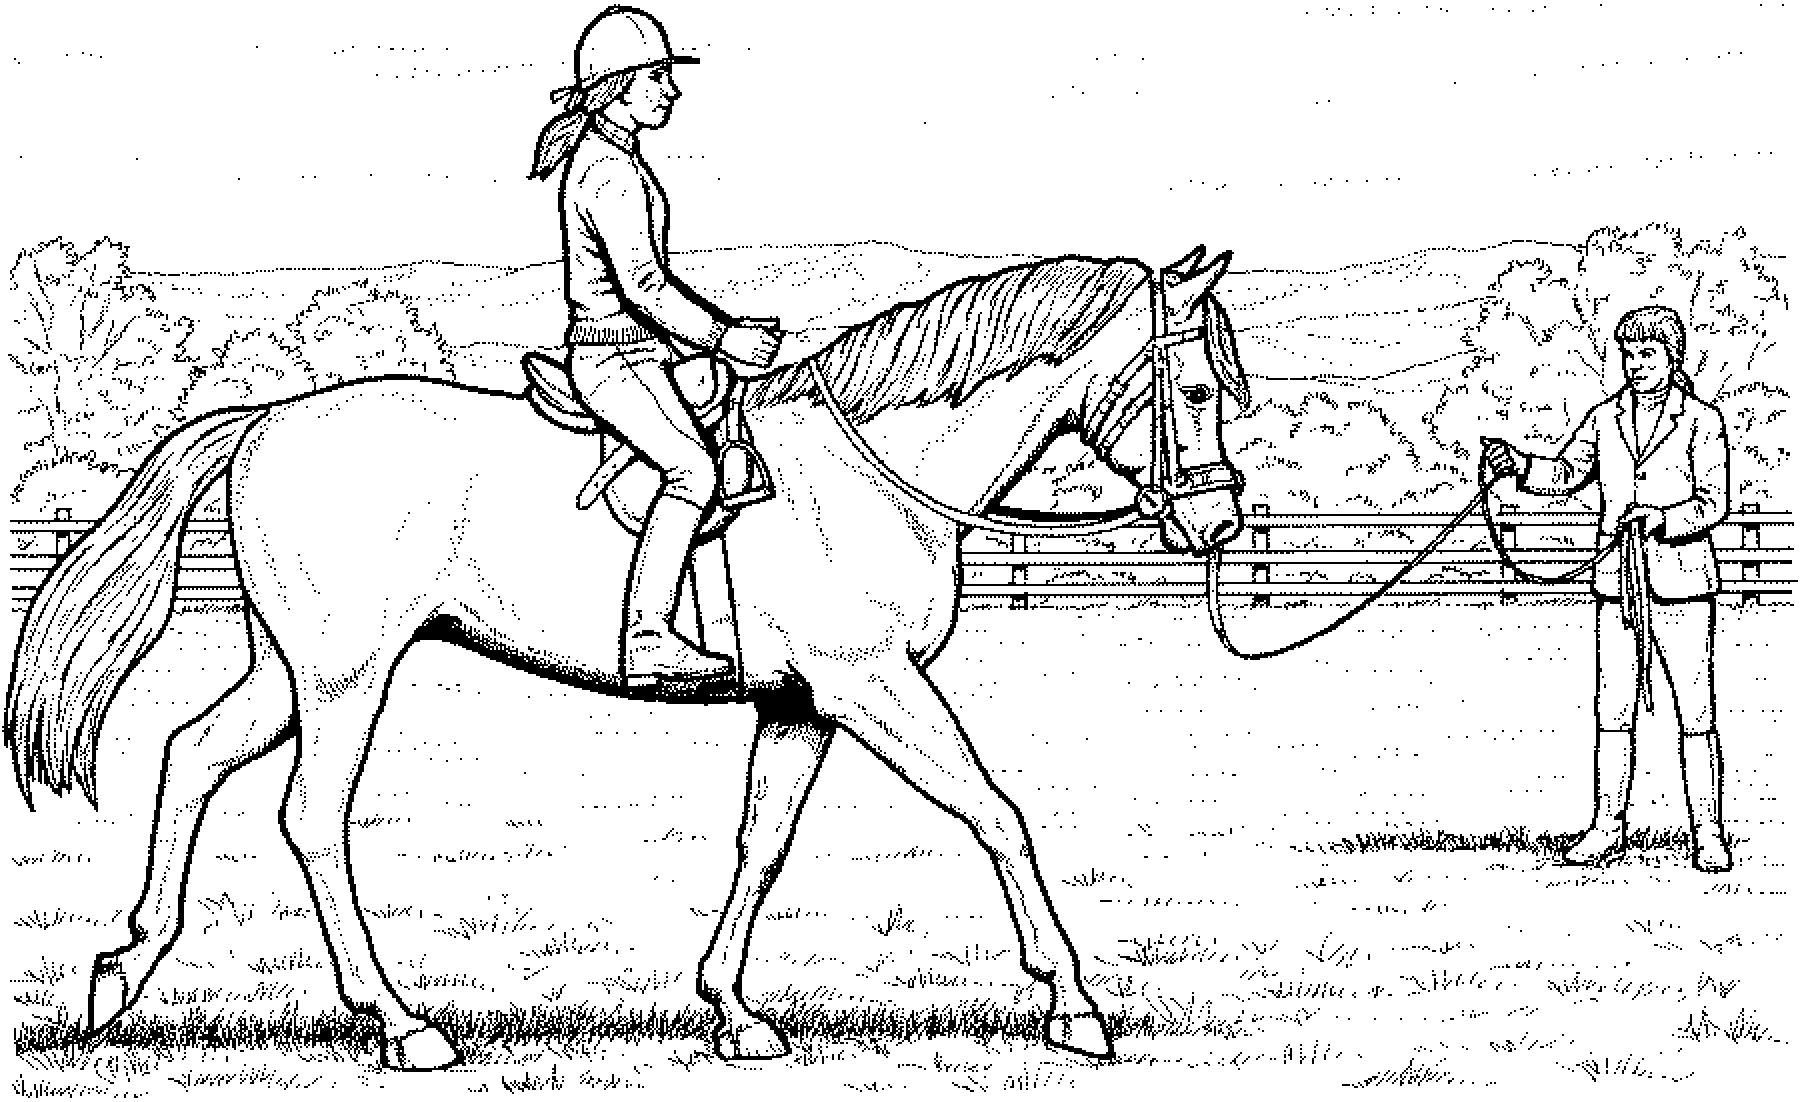 Ausmalbilder Pferde 05 | Ausmalbilder pferde, Ausmalbilder ...